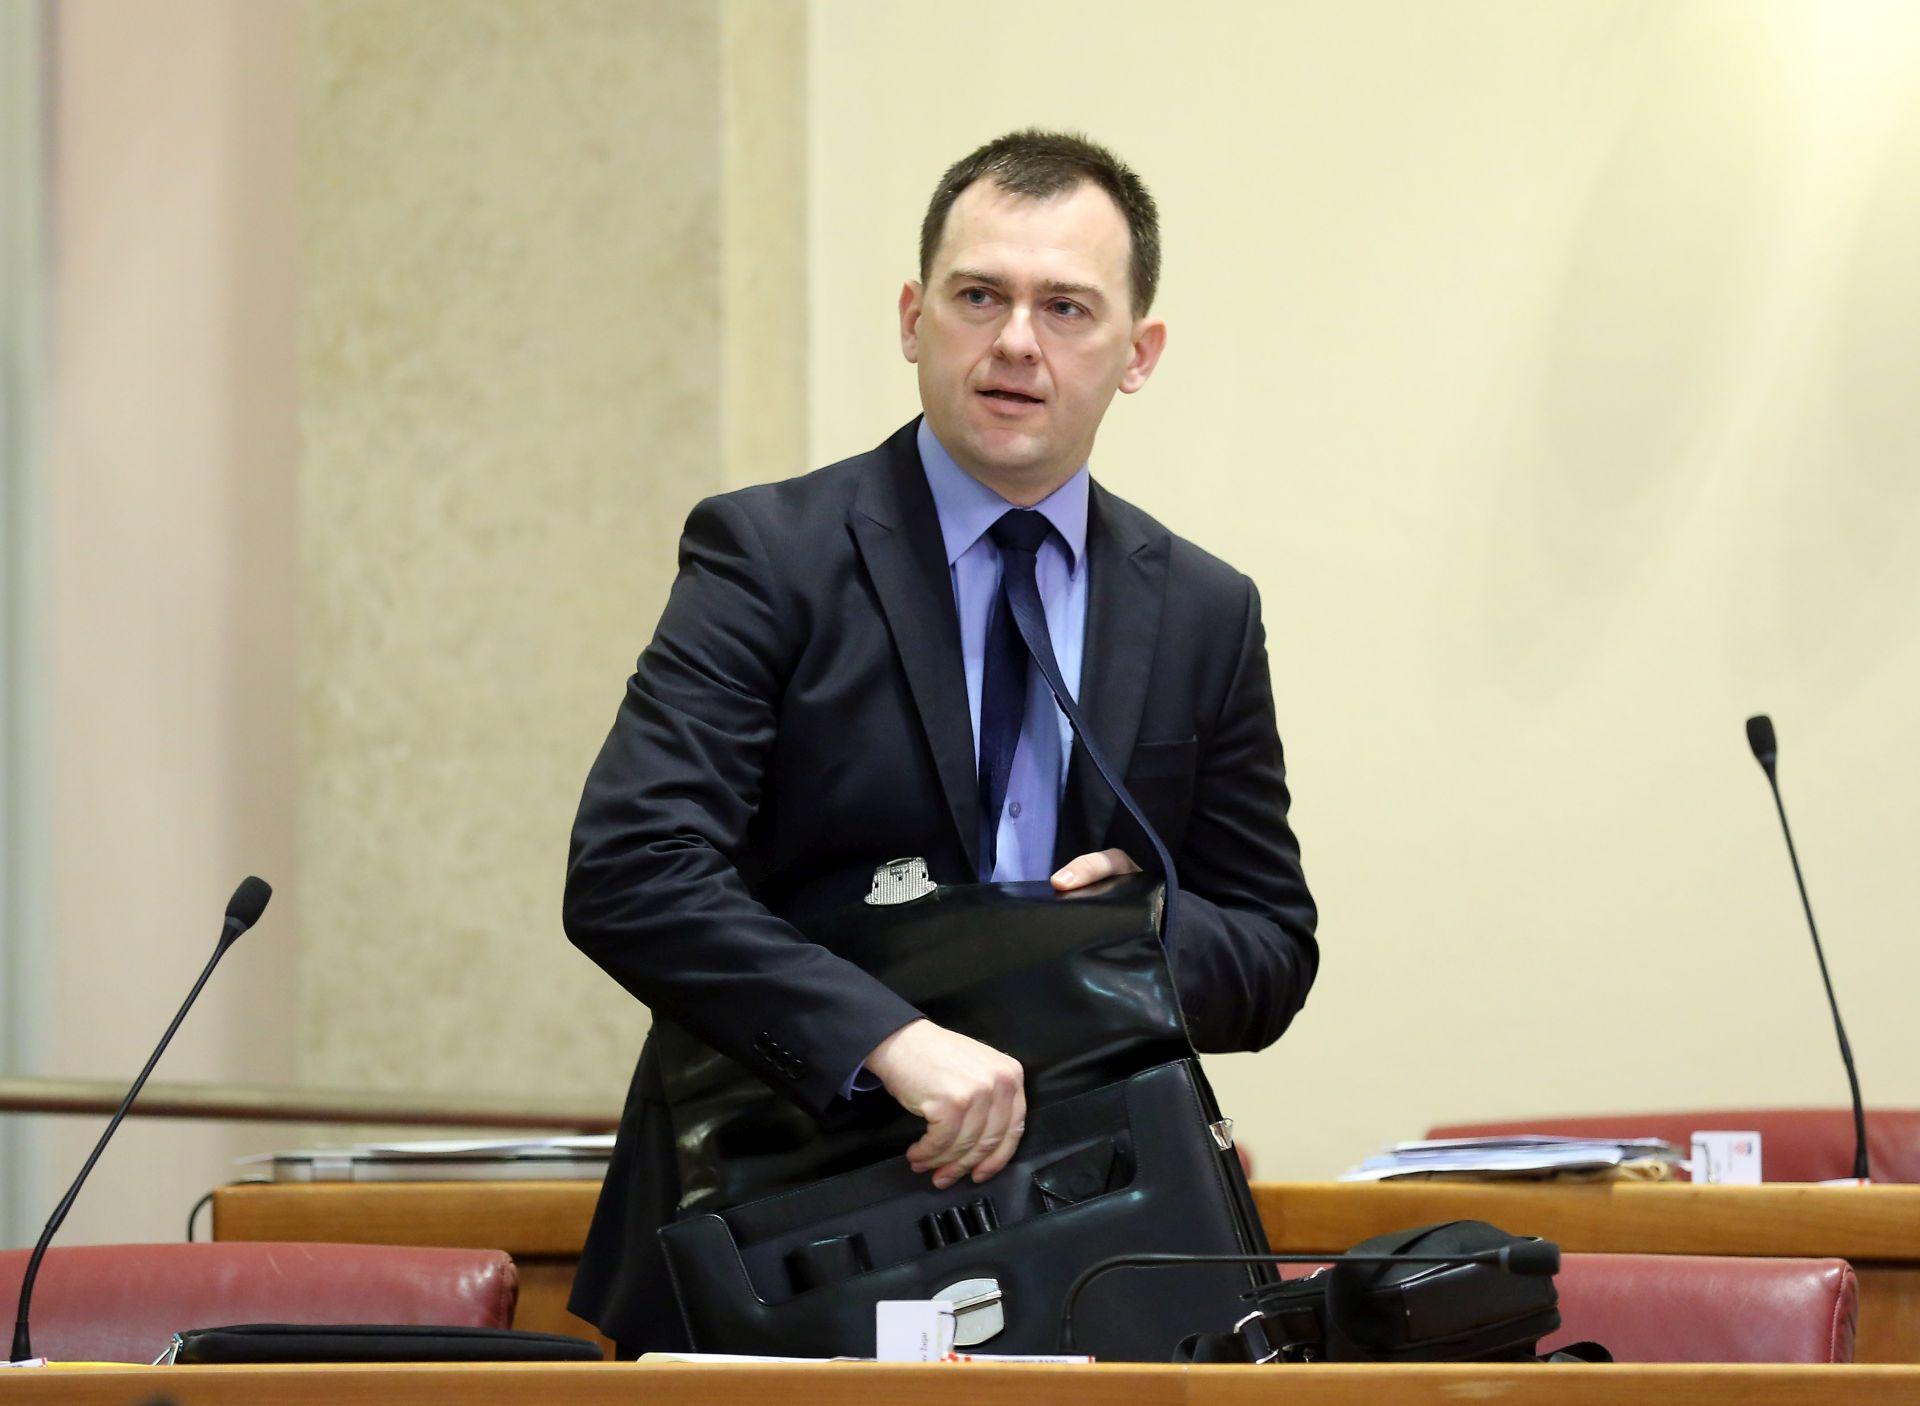 PANDEK PROTIV OSTOJIĆA: Bivši SDP-ov zastupnik tužio kolegu za klevetu